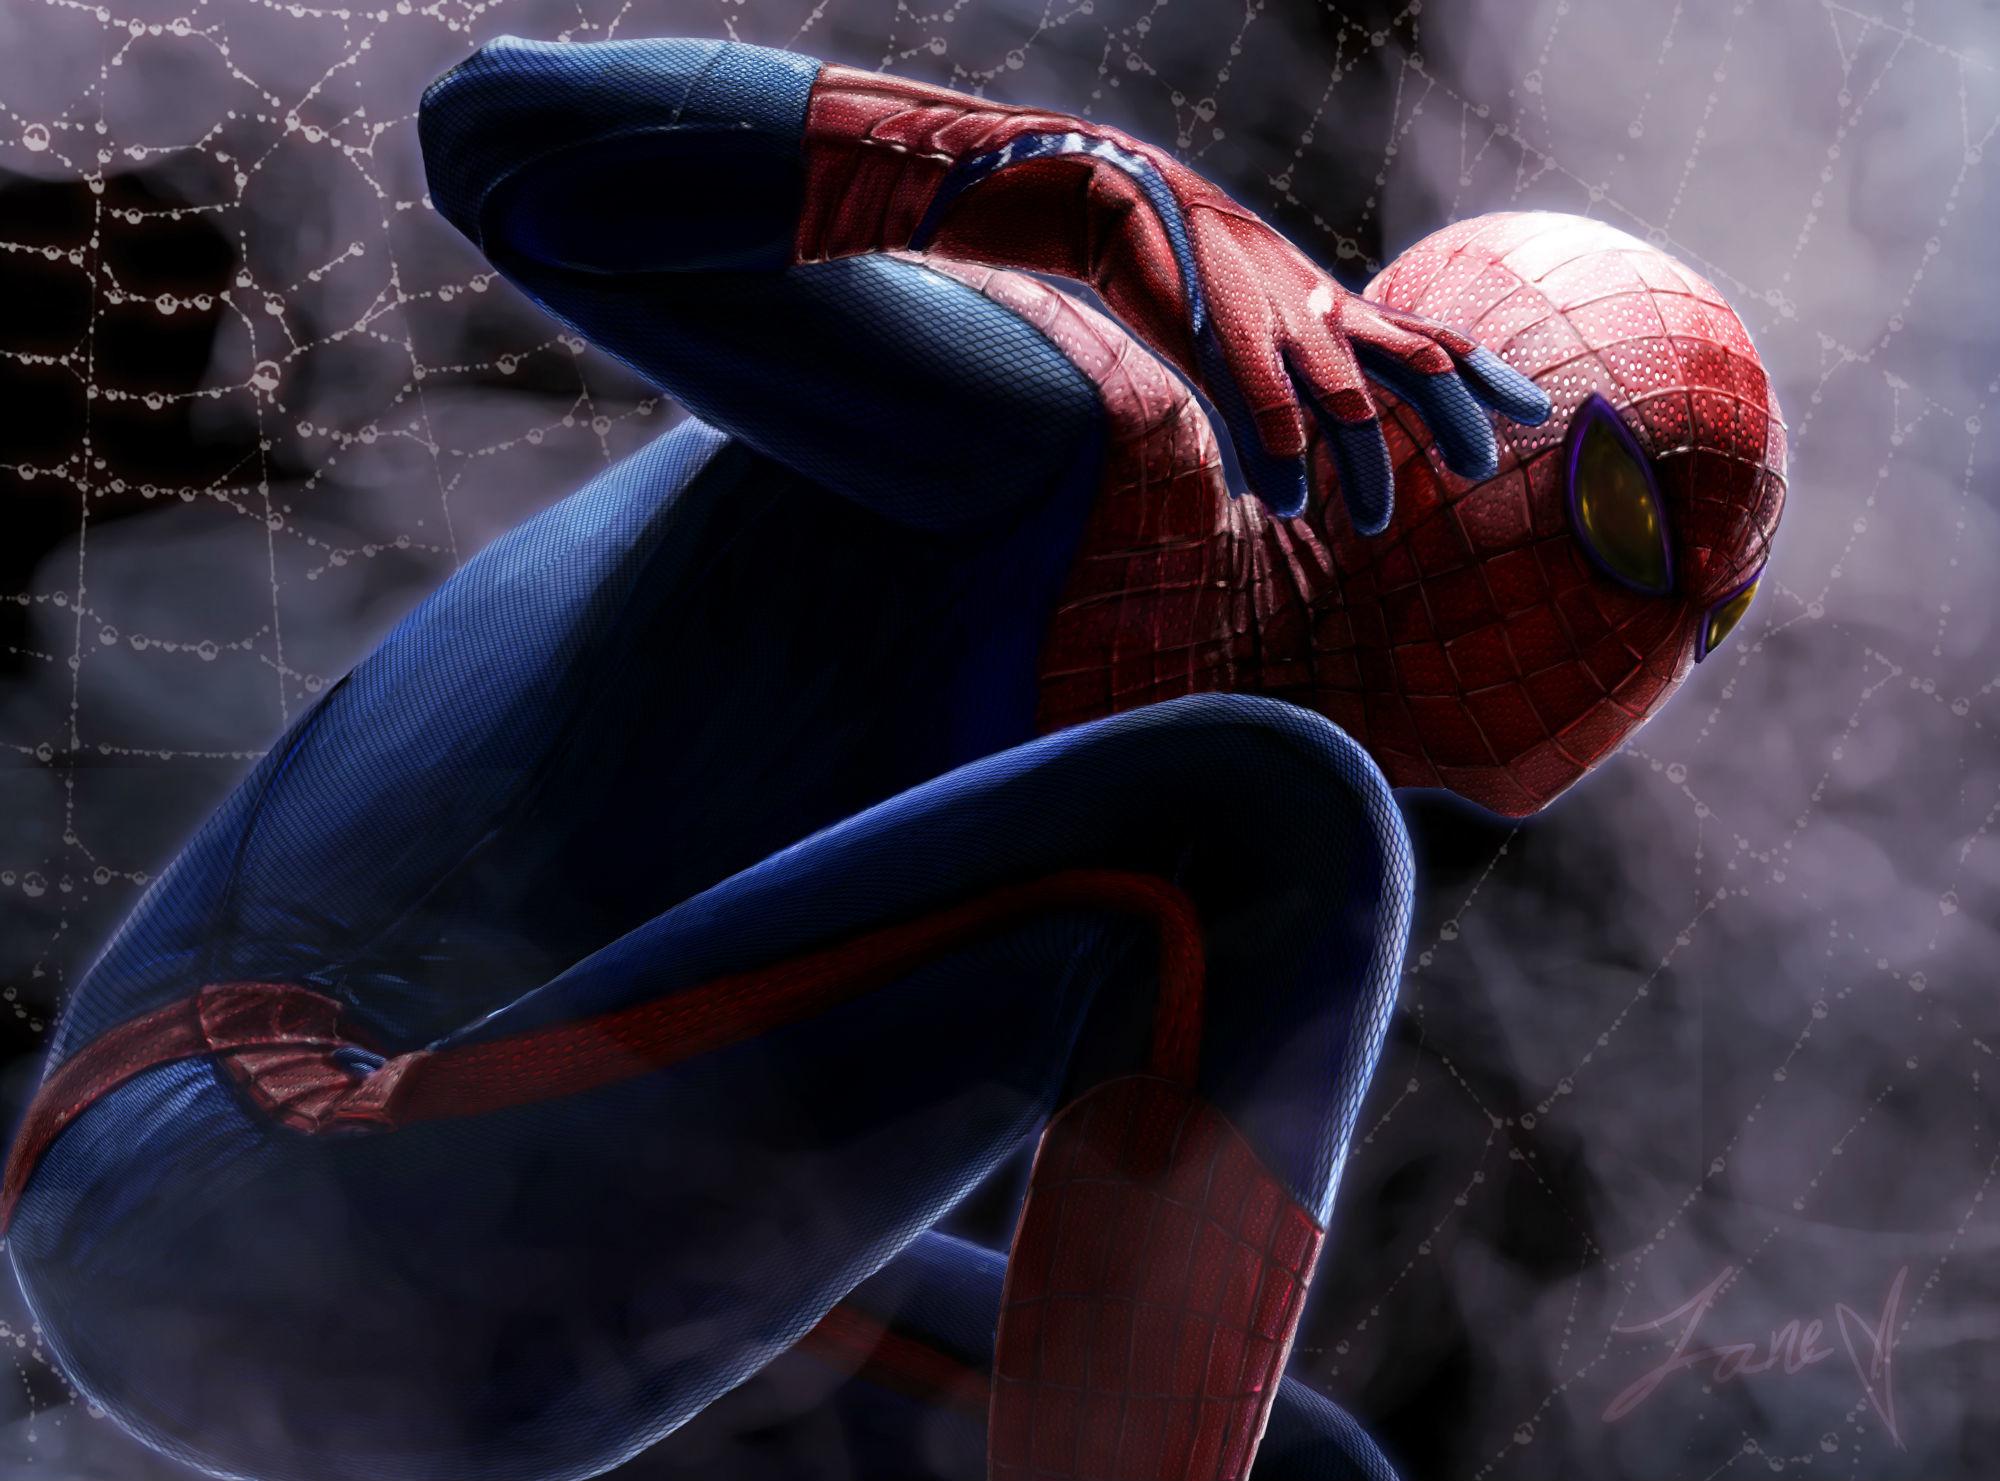 Spiderman 2018 Wallpaper 75 Images